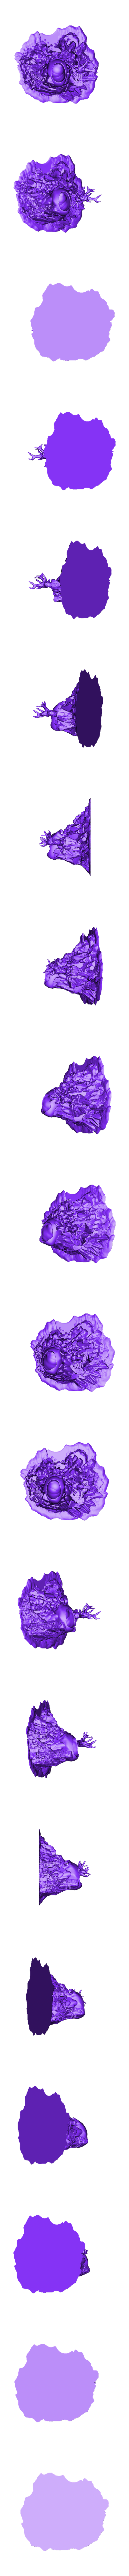 Skull Islandlow res skull island new.stl Download free STL file Cthulhu Island • 3D printable design, LittleTup